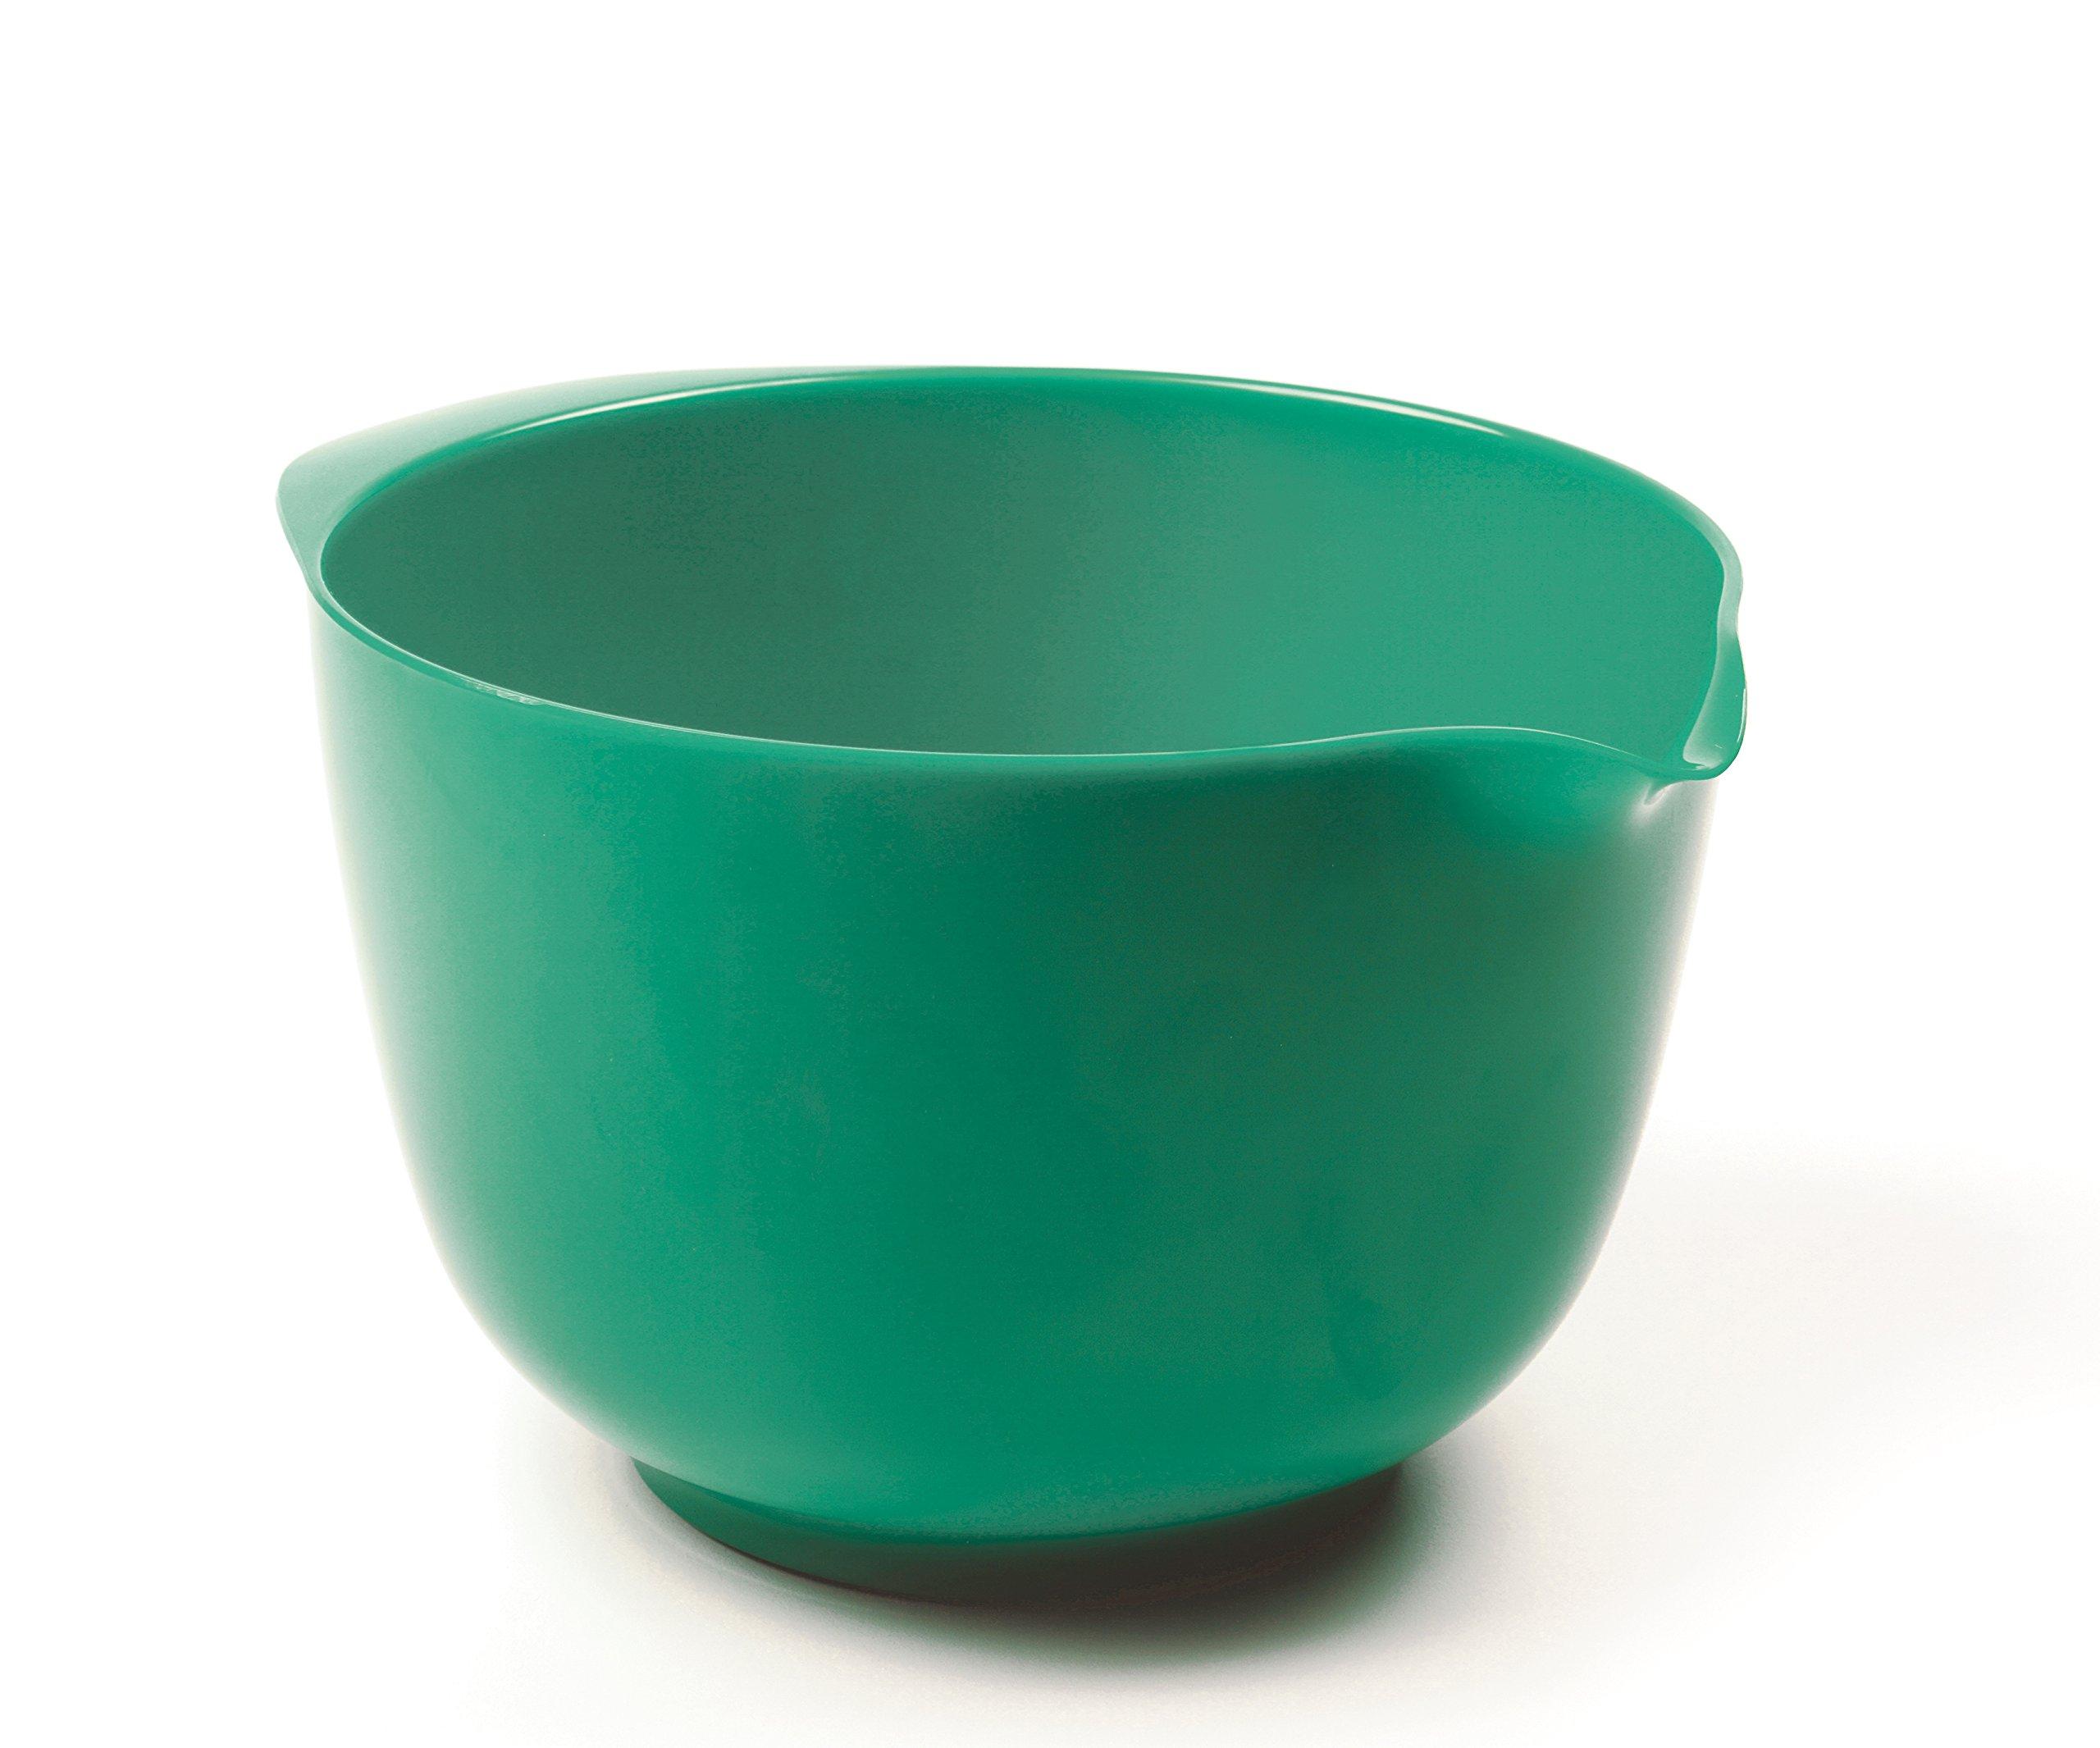 RSVP Melamine Mixing Bowl, Turquoise, 2-Quart